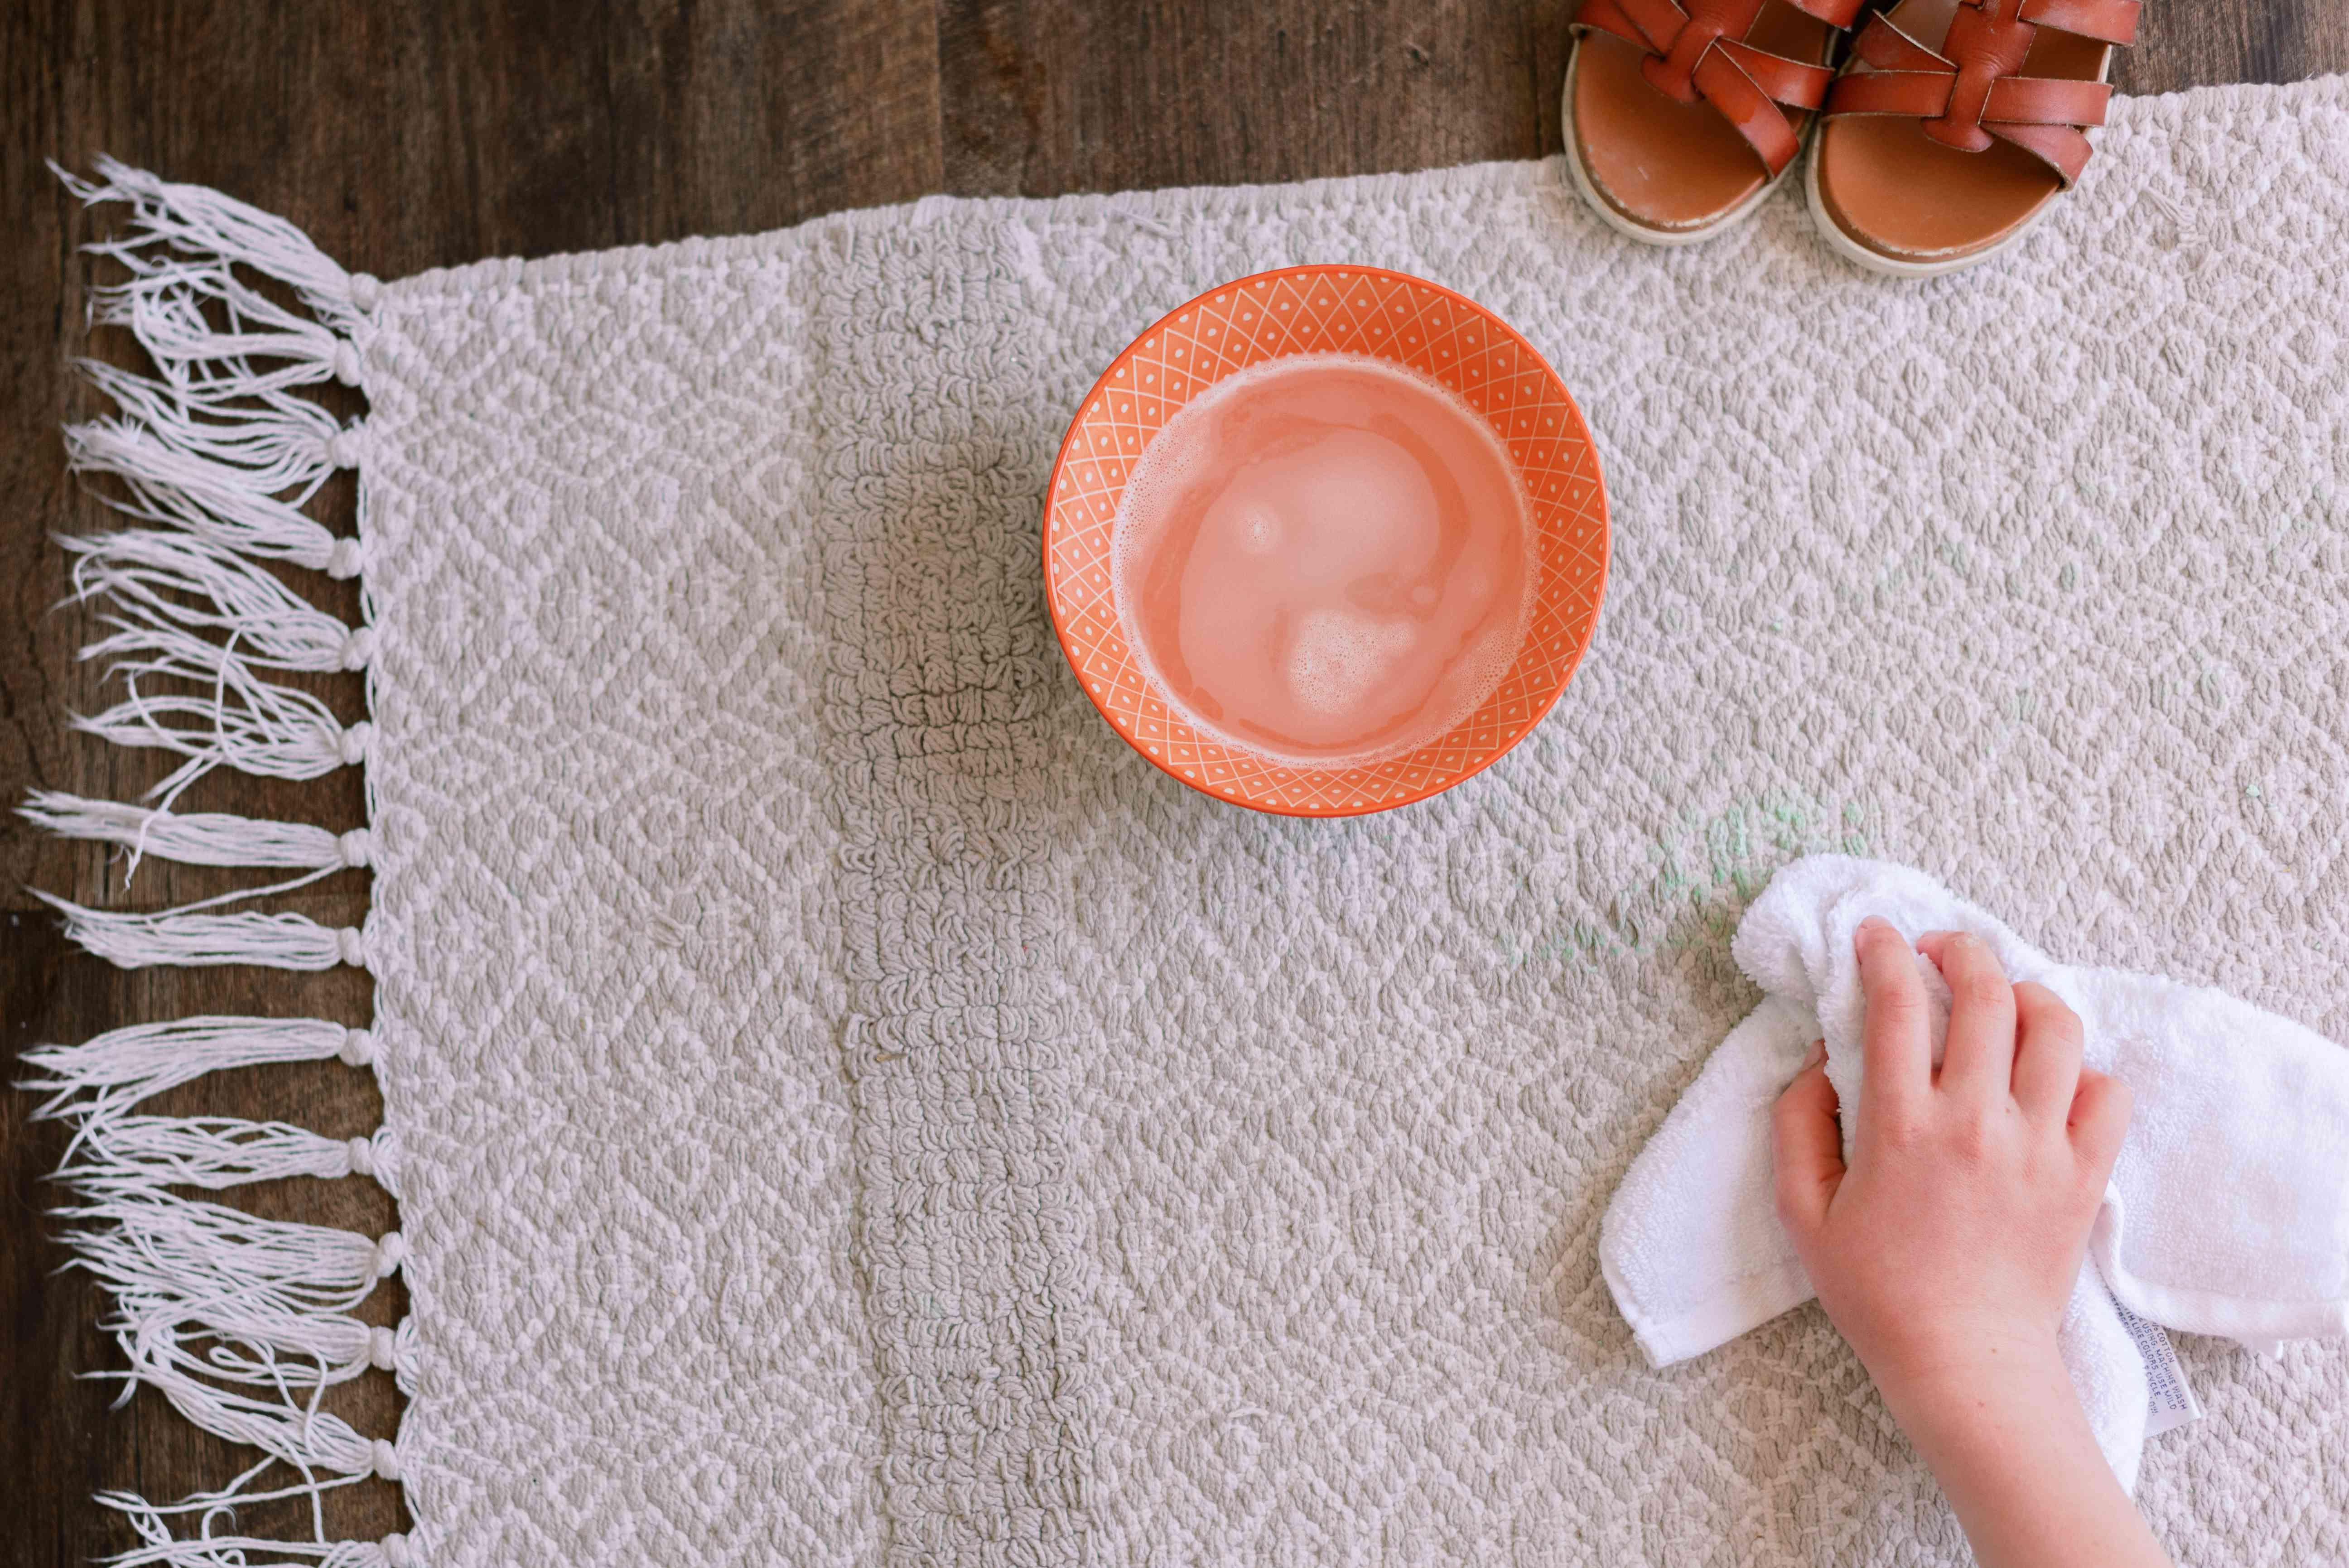 blotting the chalk stain with dishwashing liquid